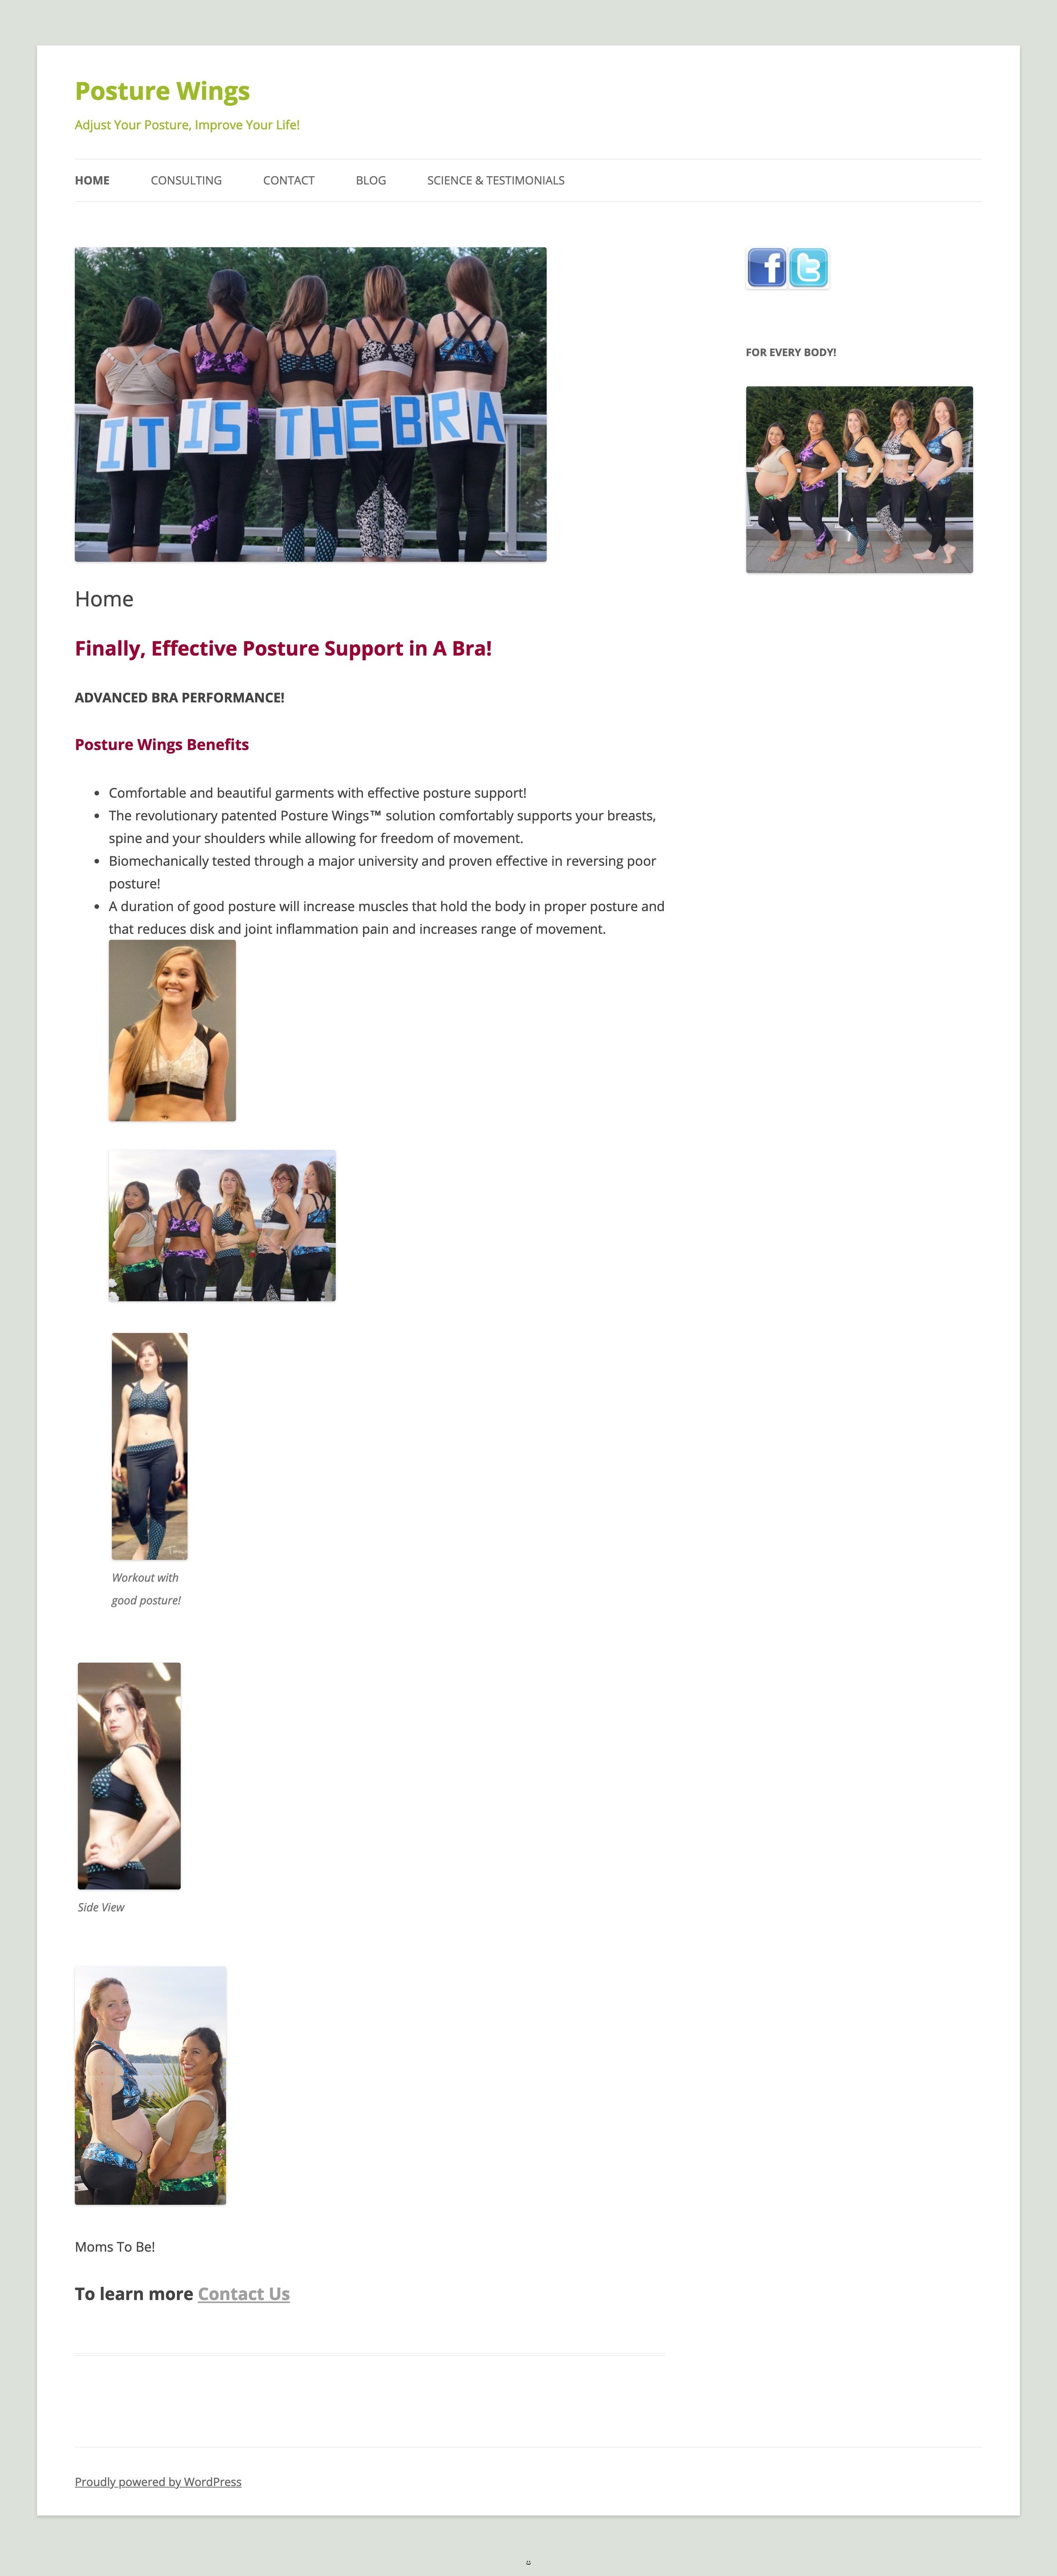 Website homepage before redesign.